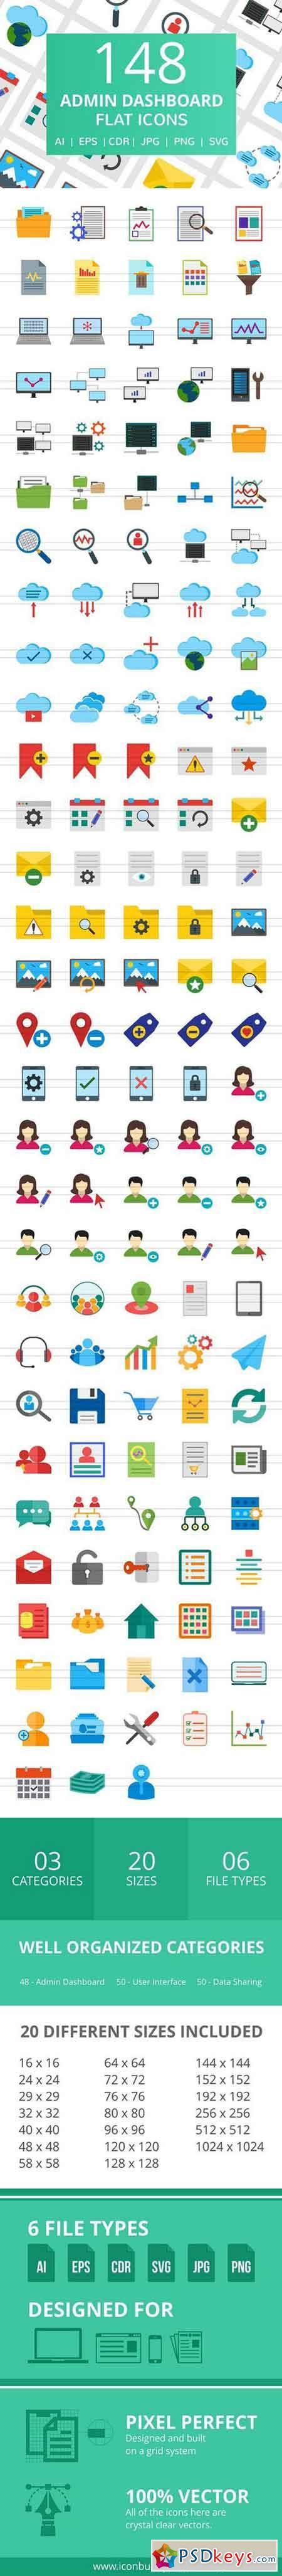 148 Admin Dashboard Flat Icons 2185436